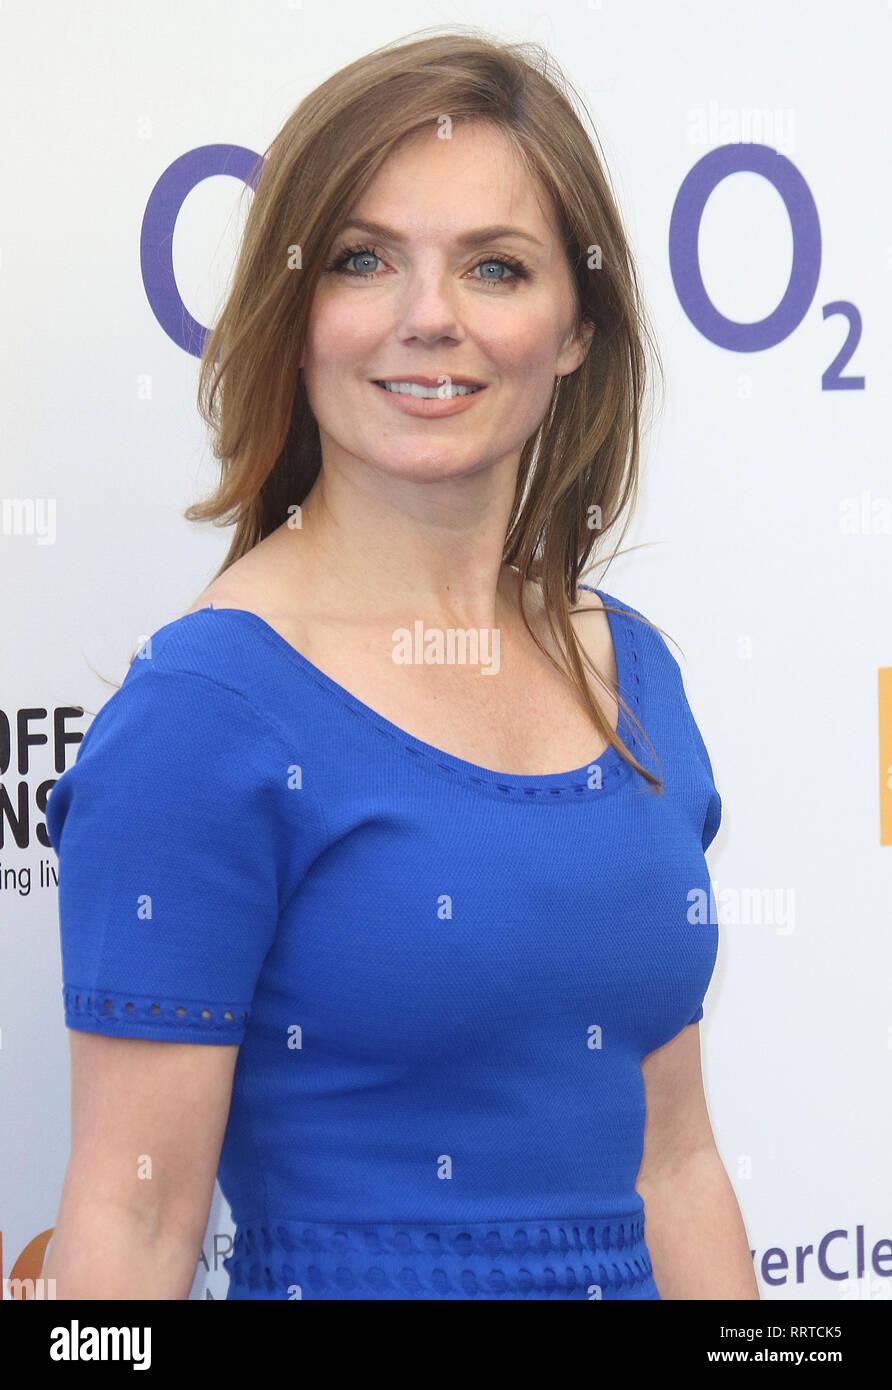 Jul 03, 2015 - London, England, UK - Nordoff Robbins O2 Silver Clef Awards 2015, Grosvenor House Hotel Photo Shows: - Stock Image